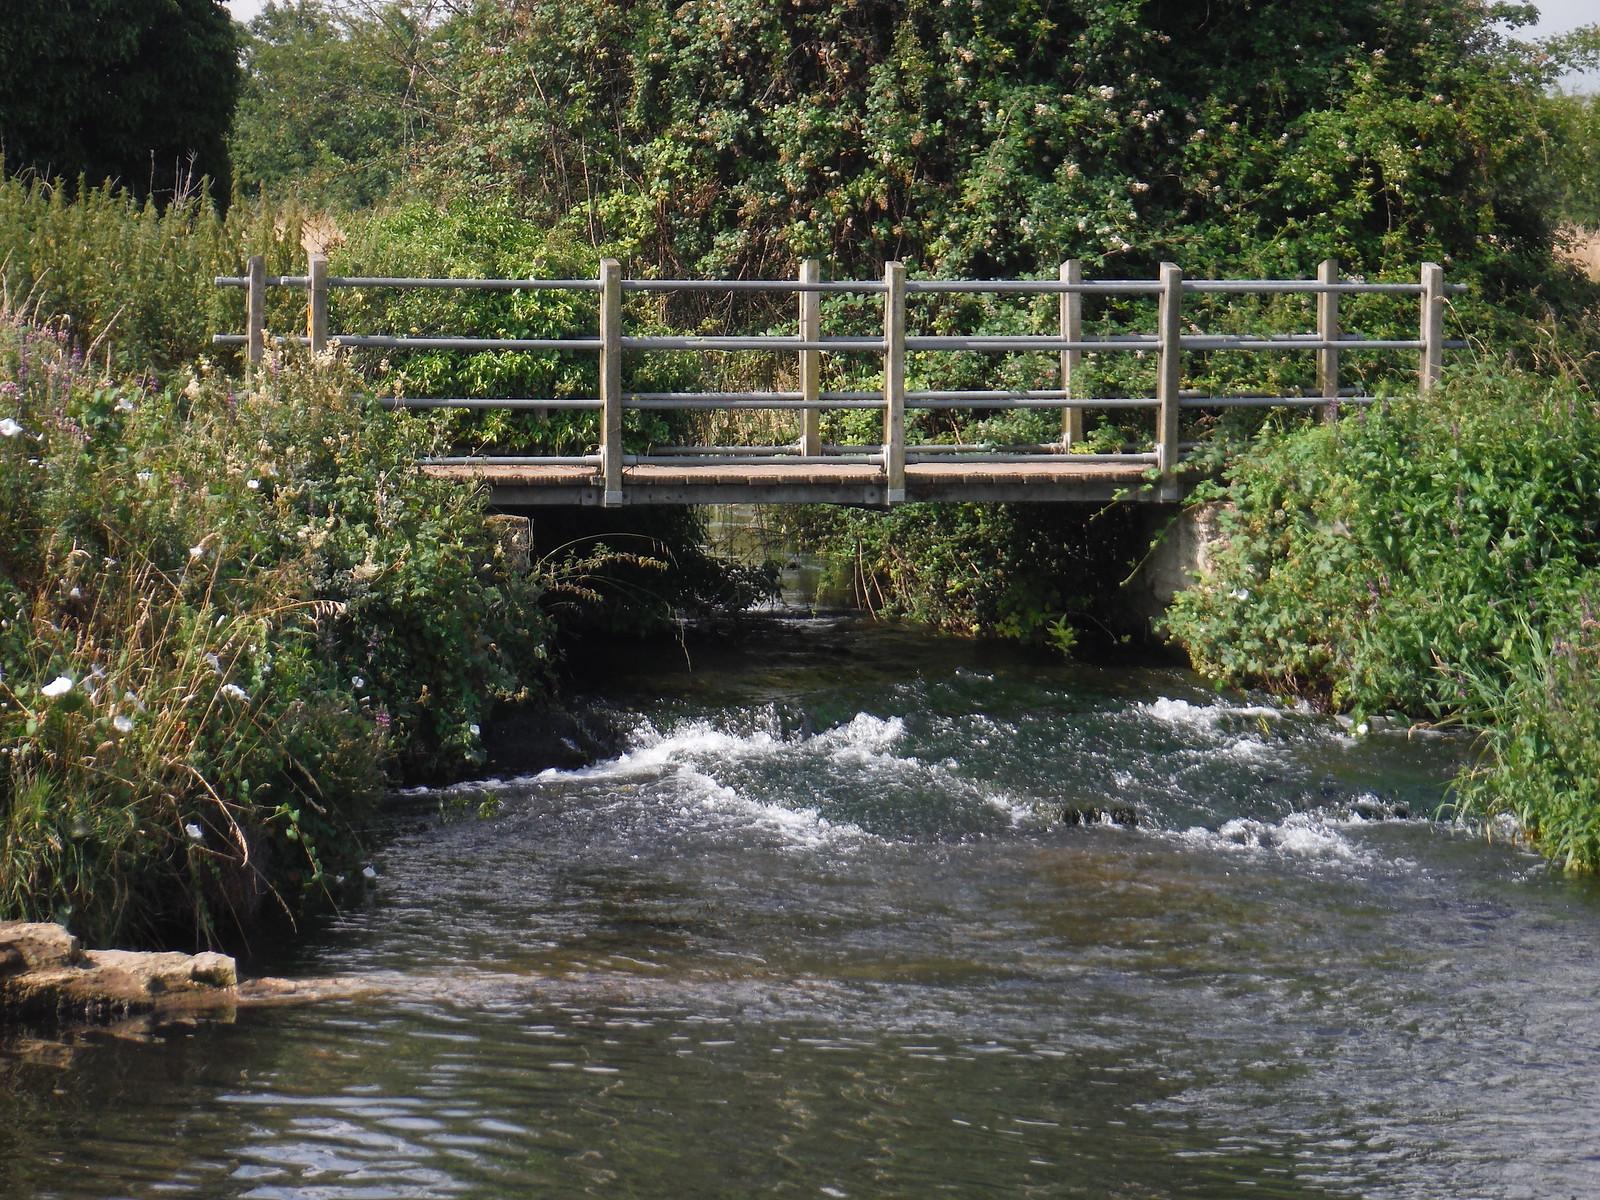 Bridge over Hiz River SWC Walk 233 - Arlesey to Letchworth Garden City